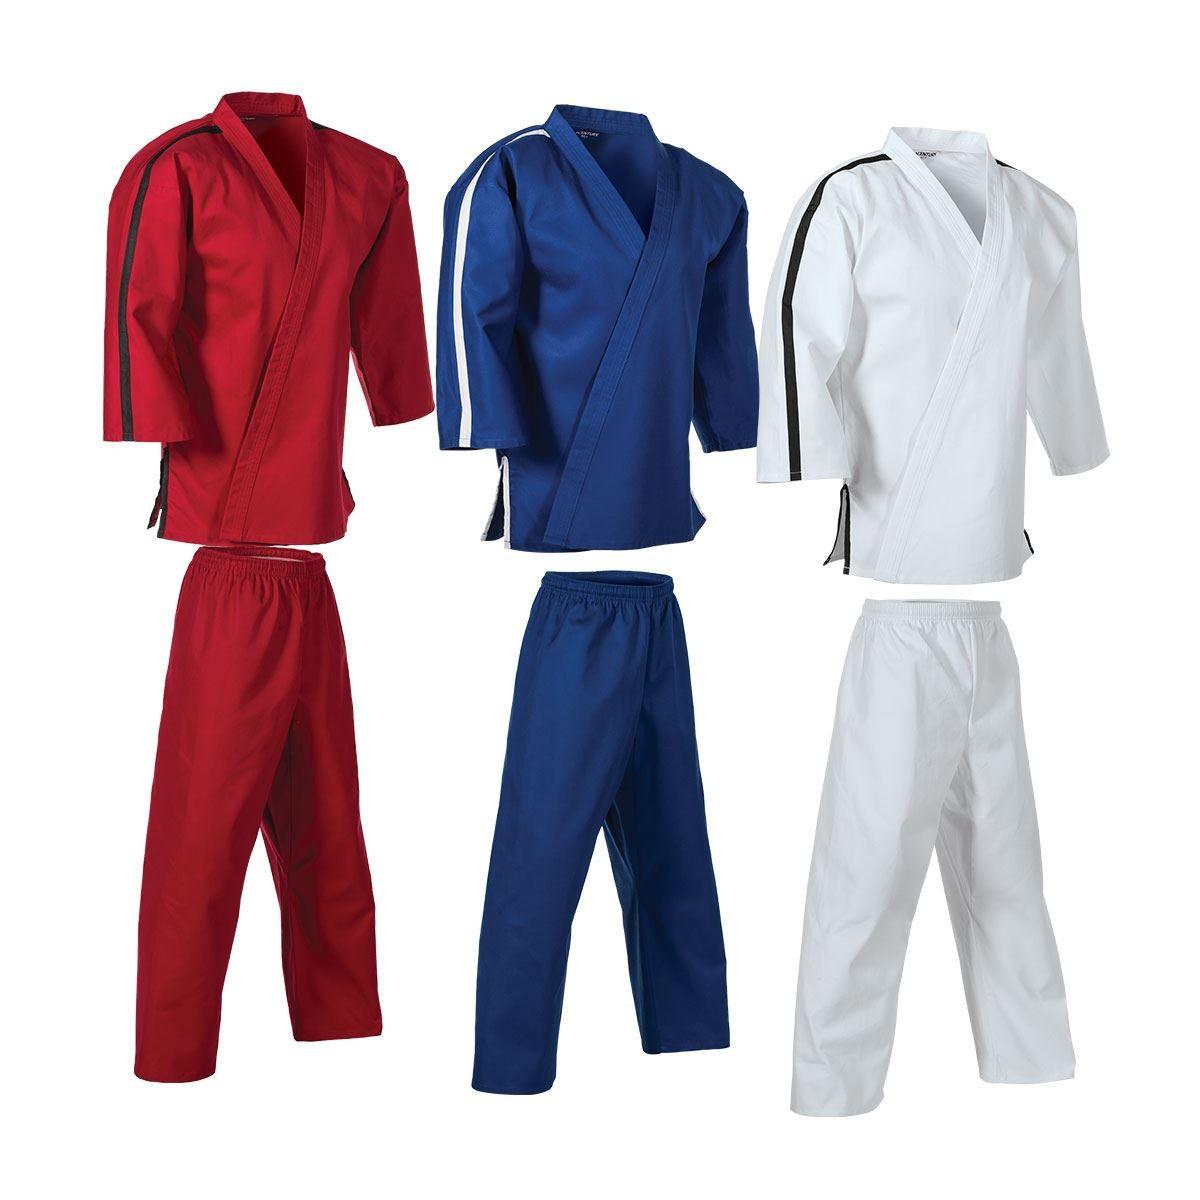 Century Martial Arts 7.25 oz. Crossover Program Uniform - Level 1